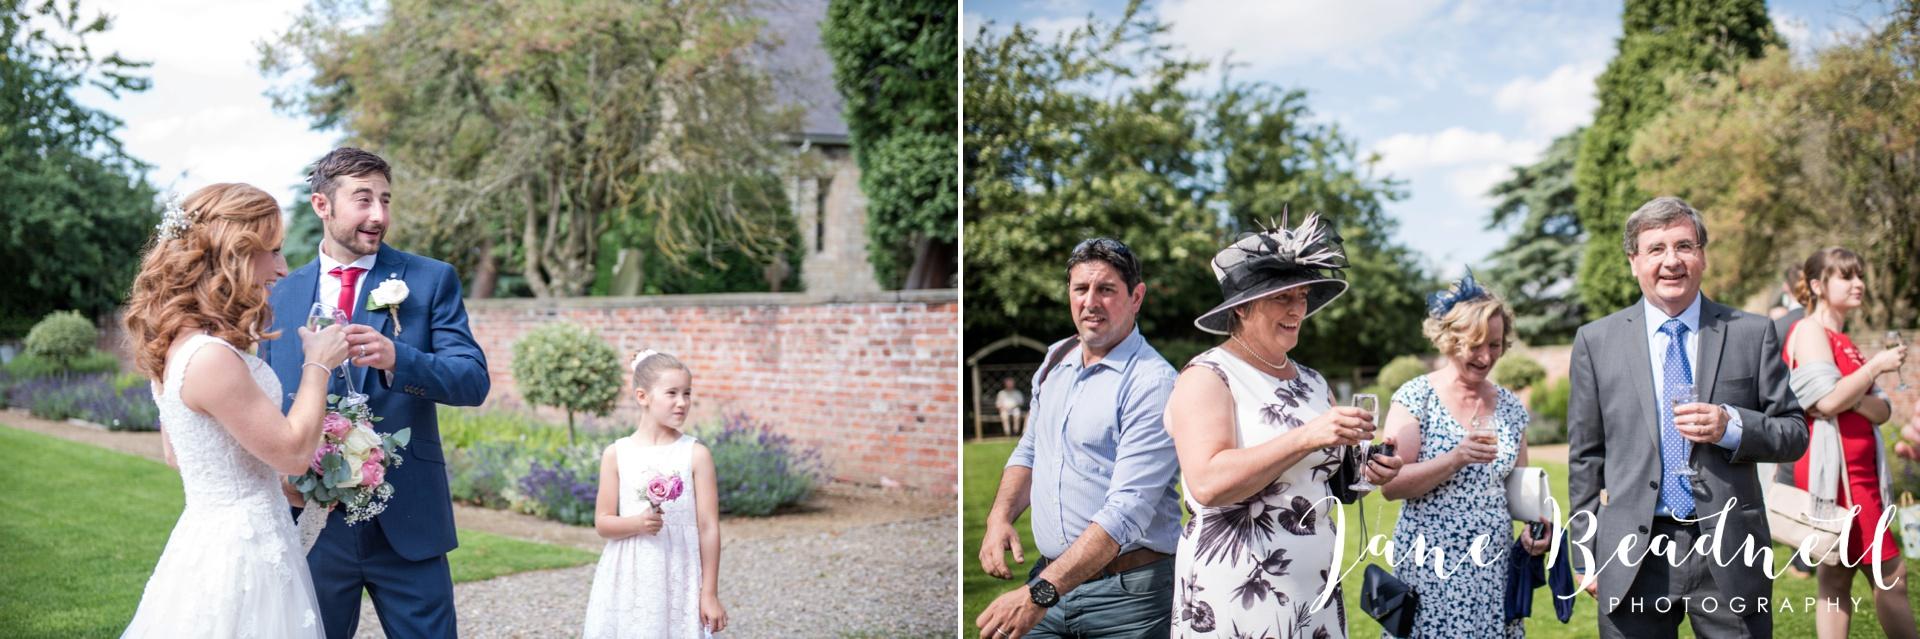 yorkshire-fine-art-wedding-photographer-jane-beadnell-photography-poppleton-york_0070